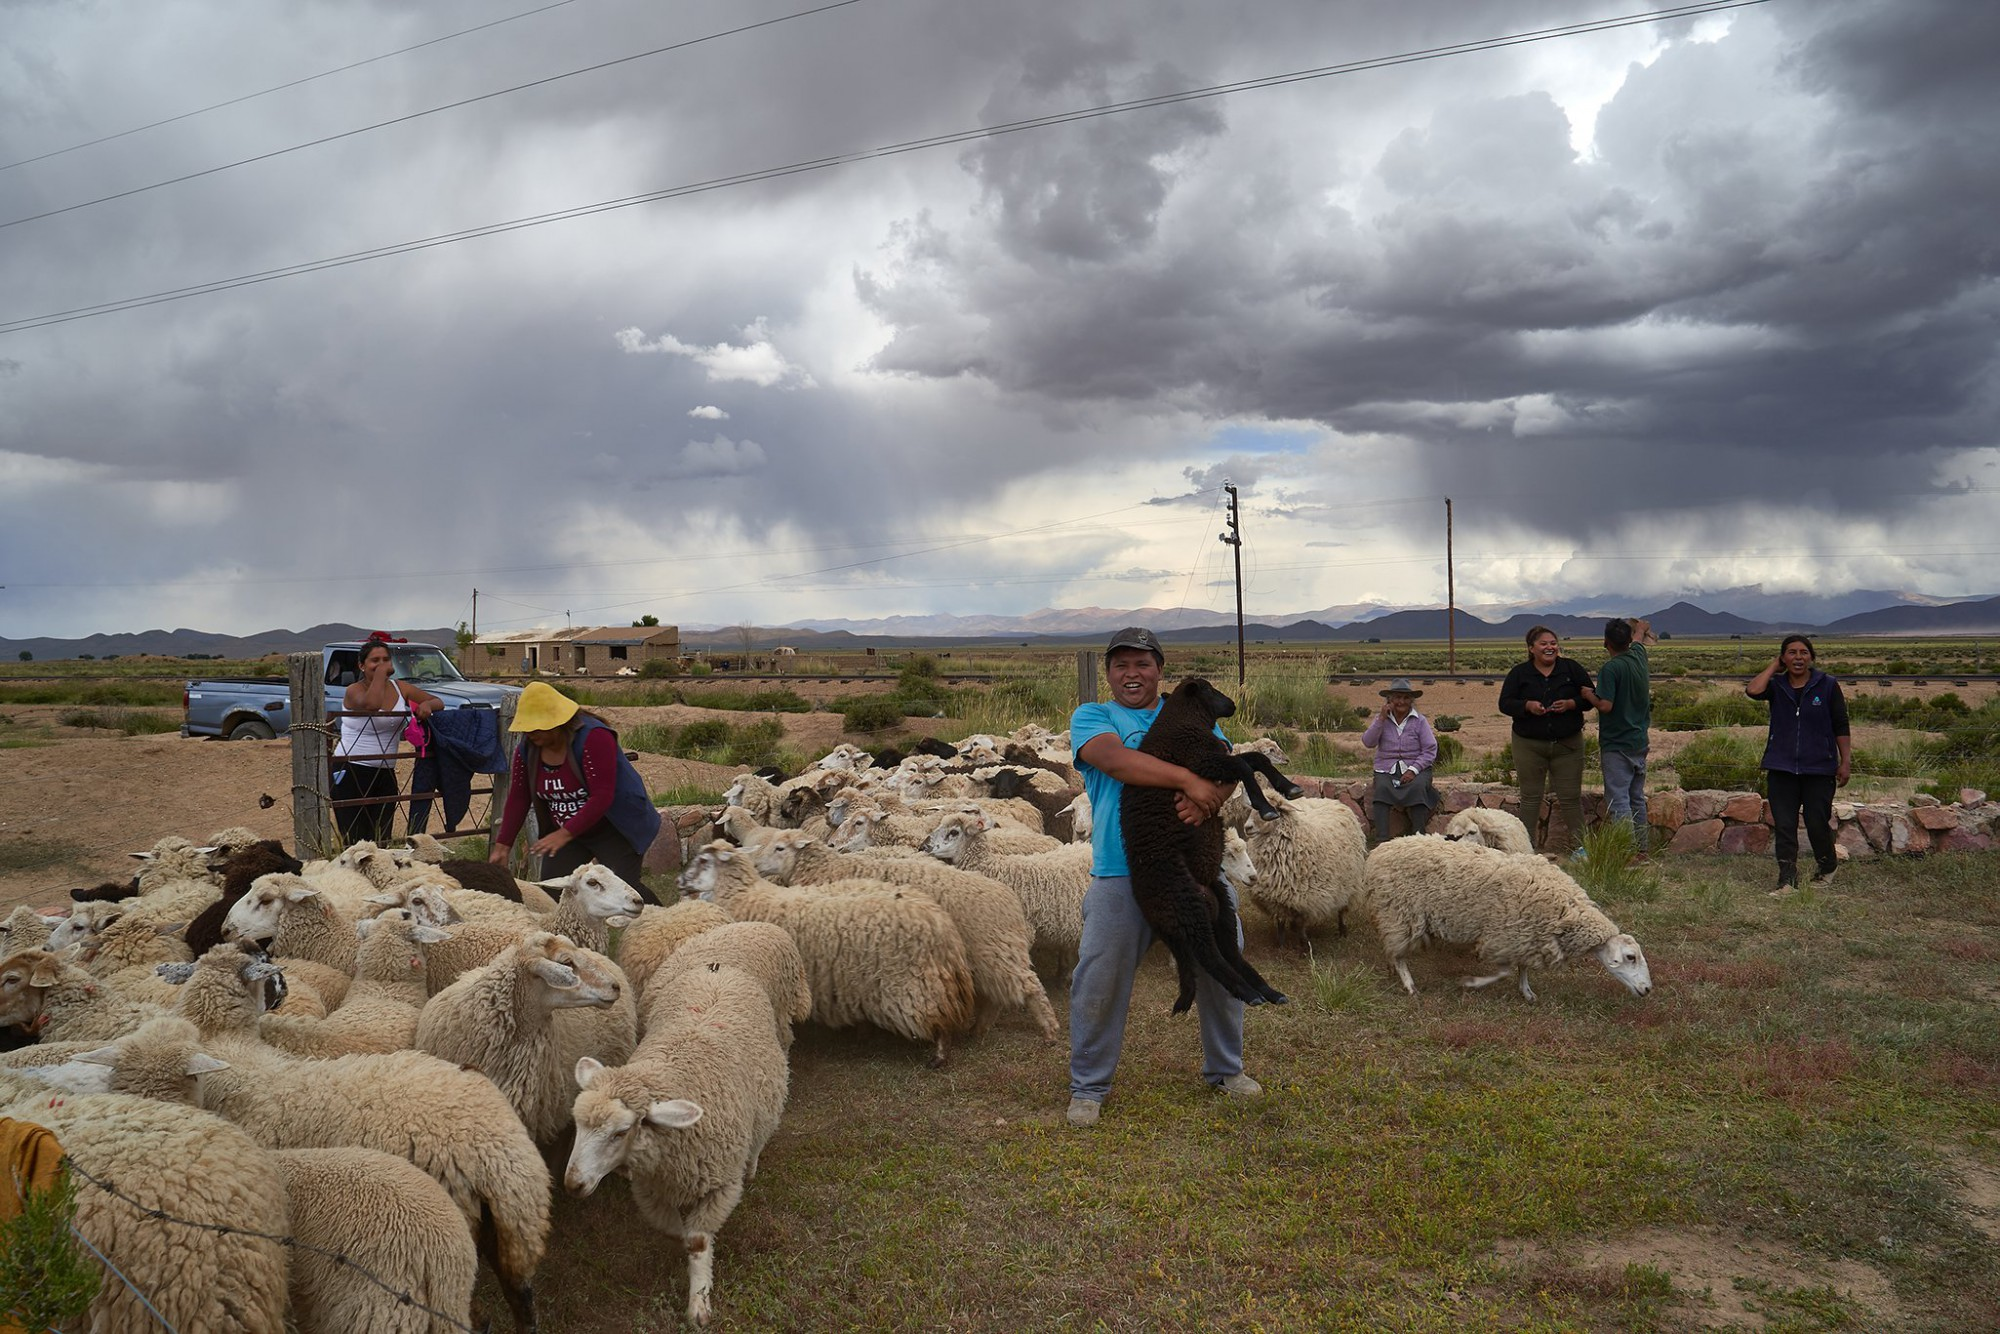 Afbeelding: Reisreportage Argentinië, reisfotografie © Dominique Van Huffel